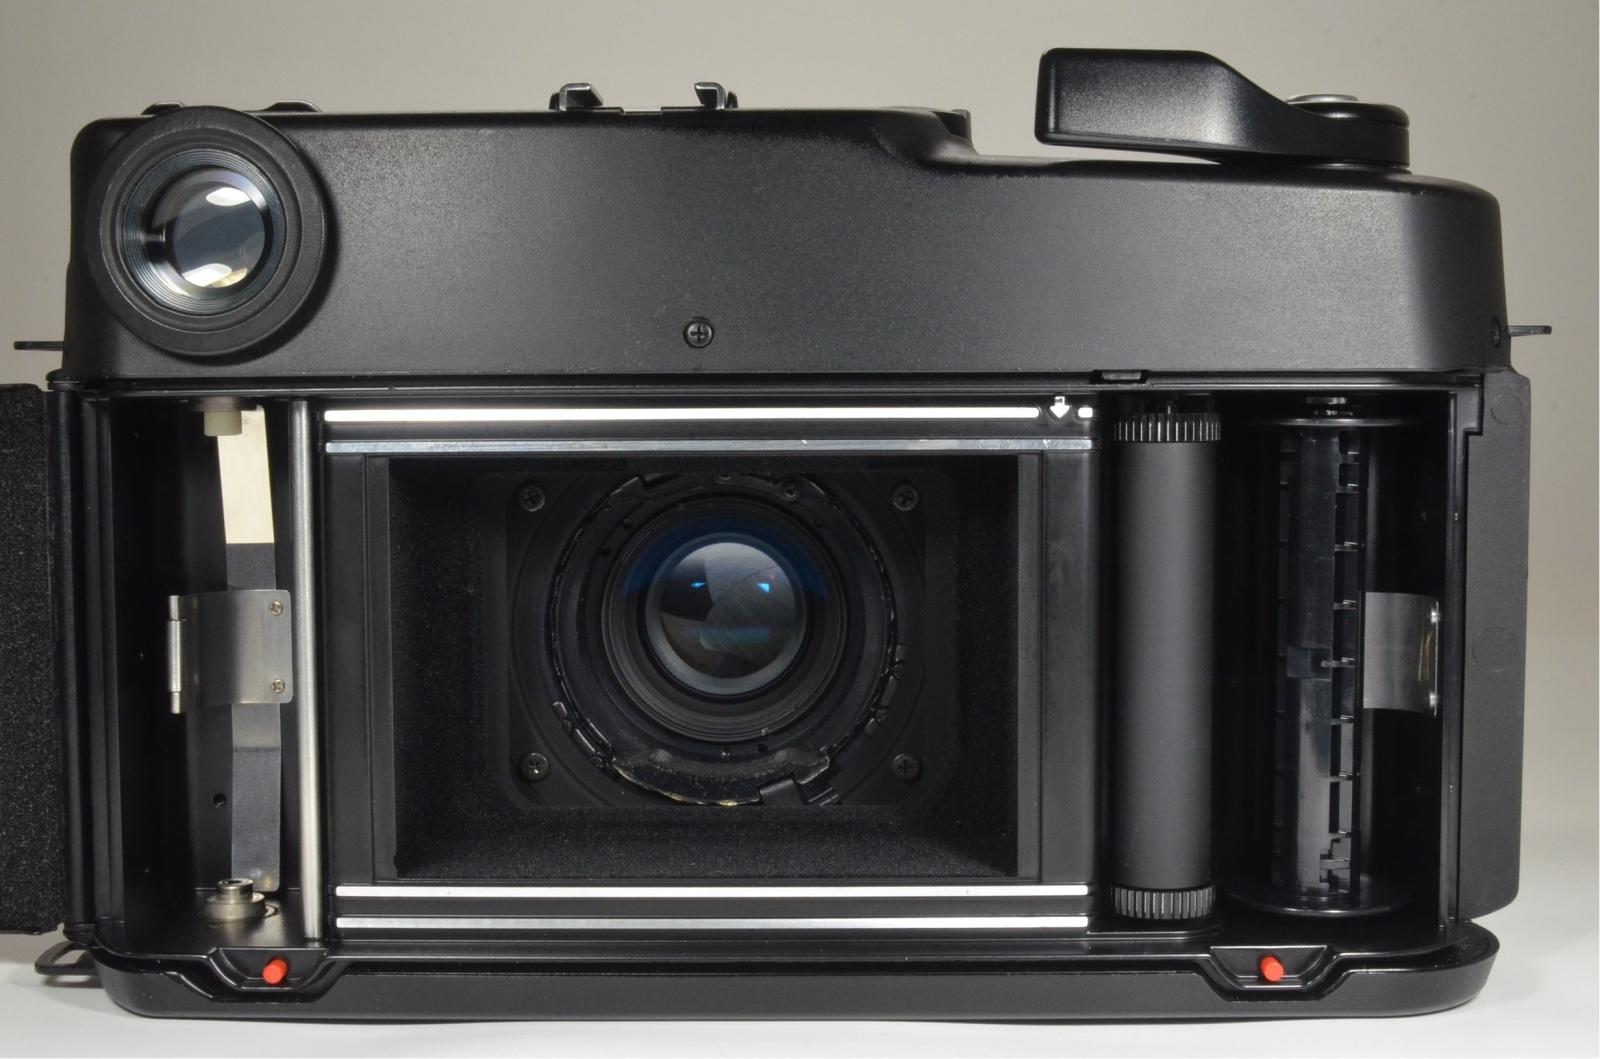 fuji fujifilm gw690iii 90mm f3.5 medium format count only '009' very rare!